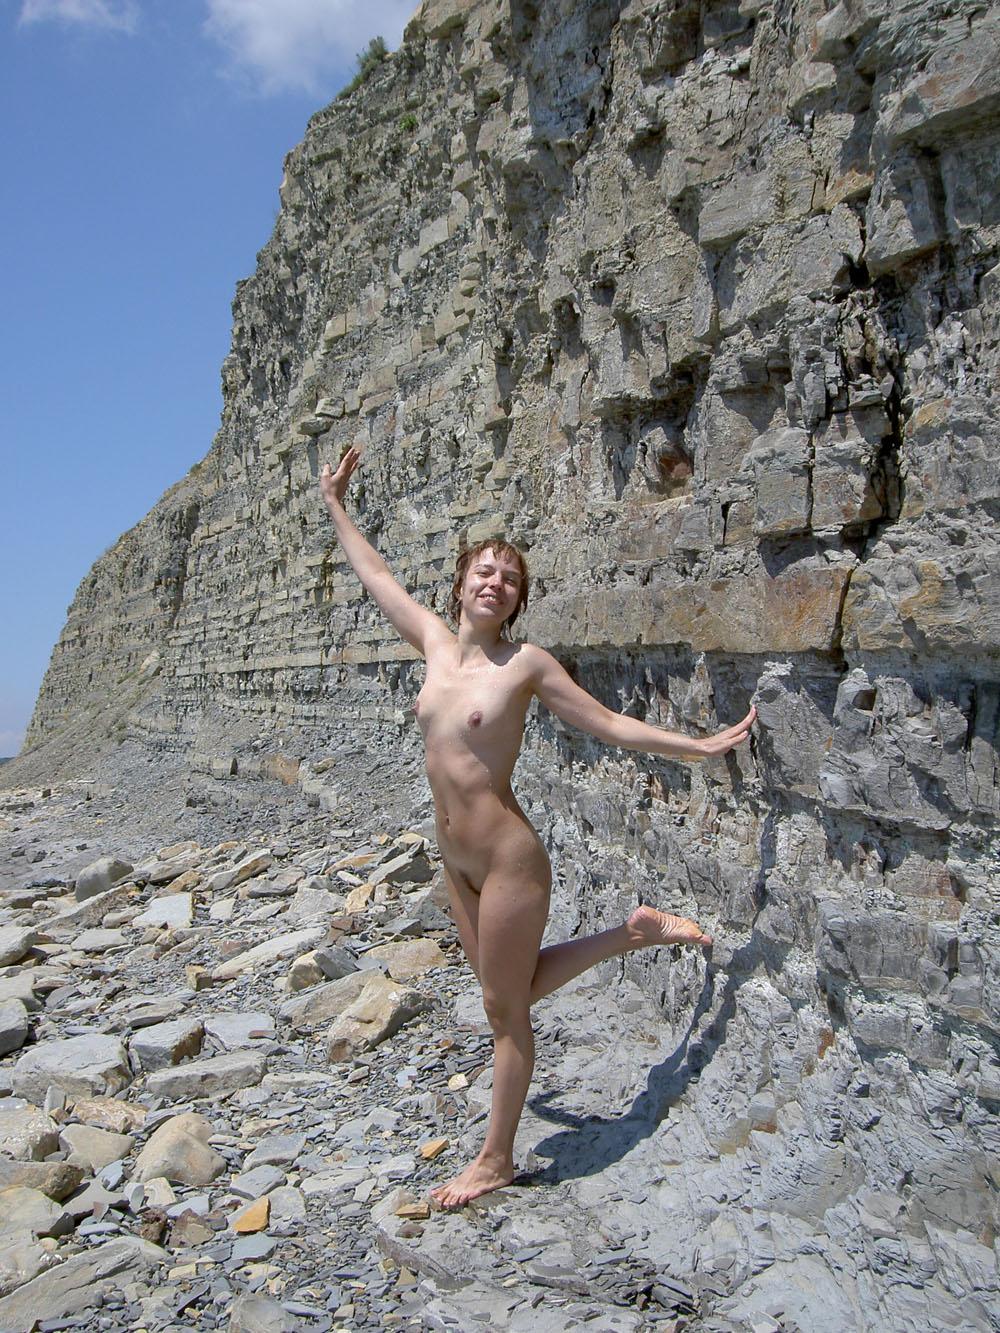 Nude happy girl near a wall of rocks